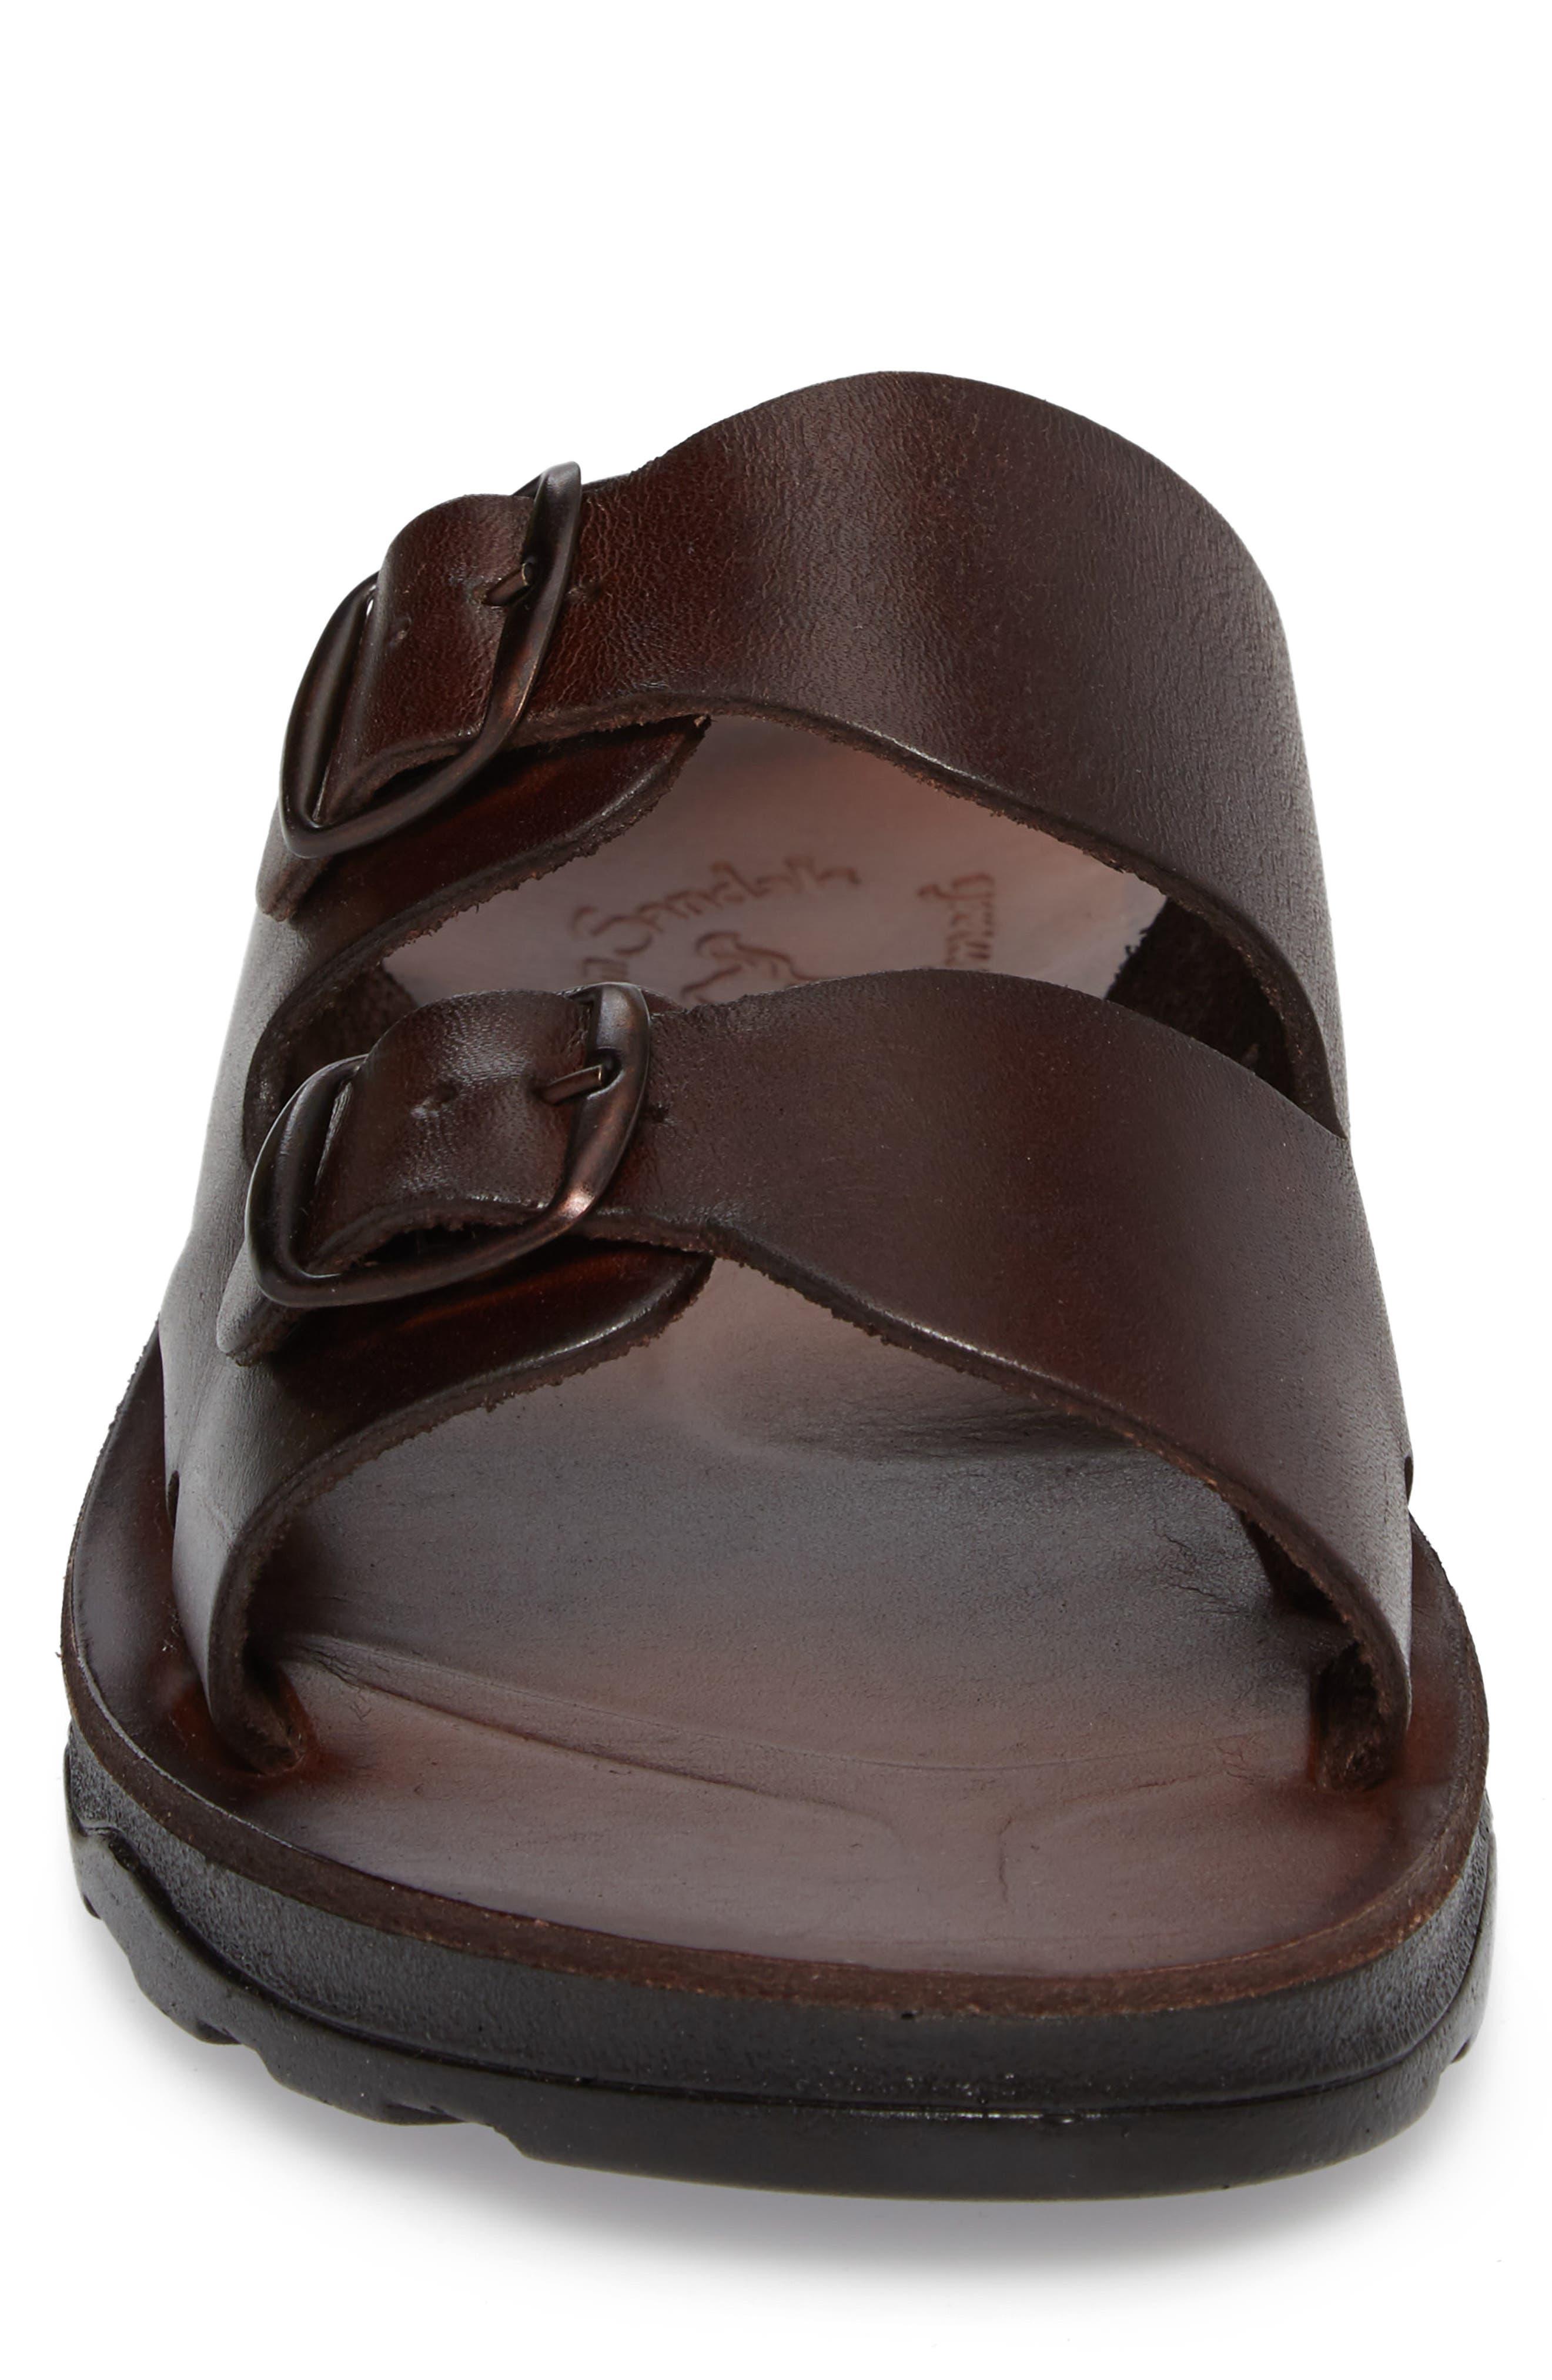 Barnabas Sandal,                             Alternate thumbnail 4, color,                             Brown Leather